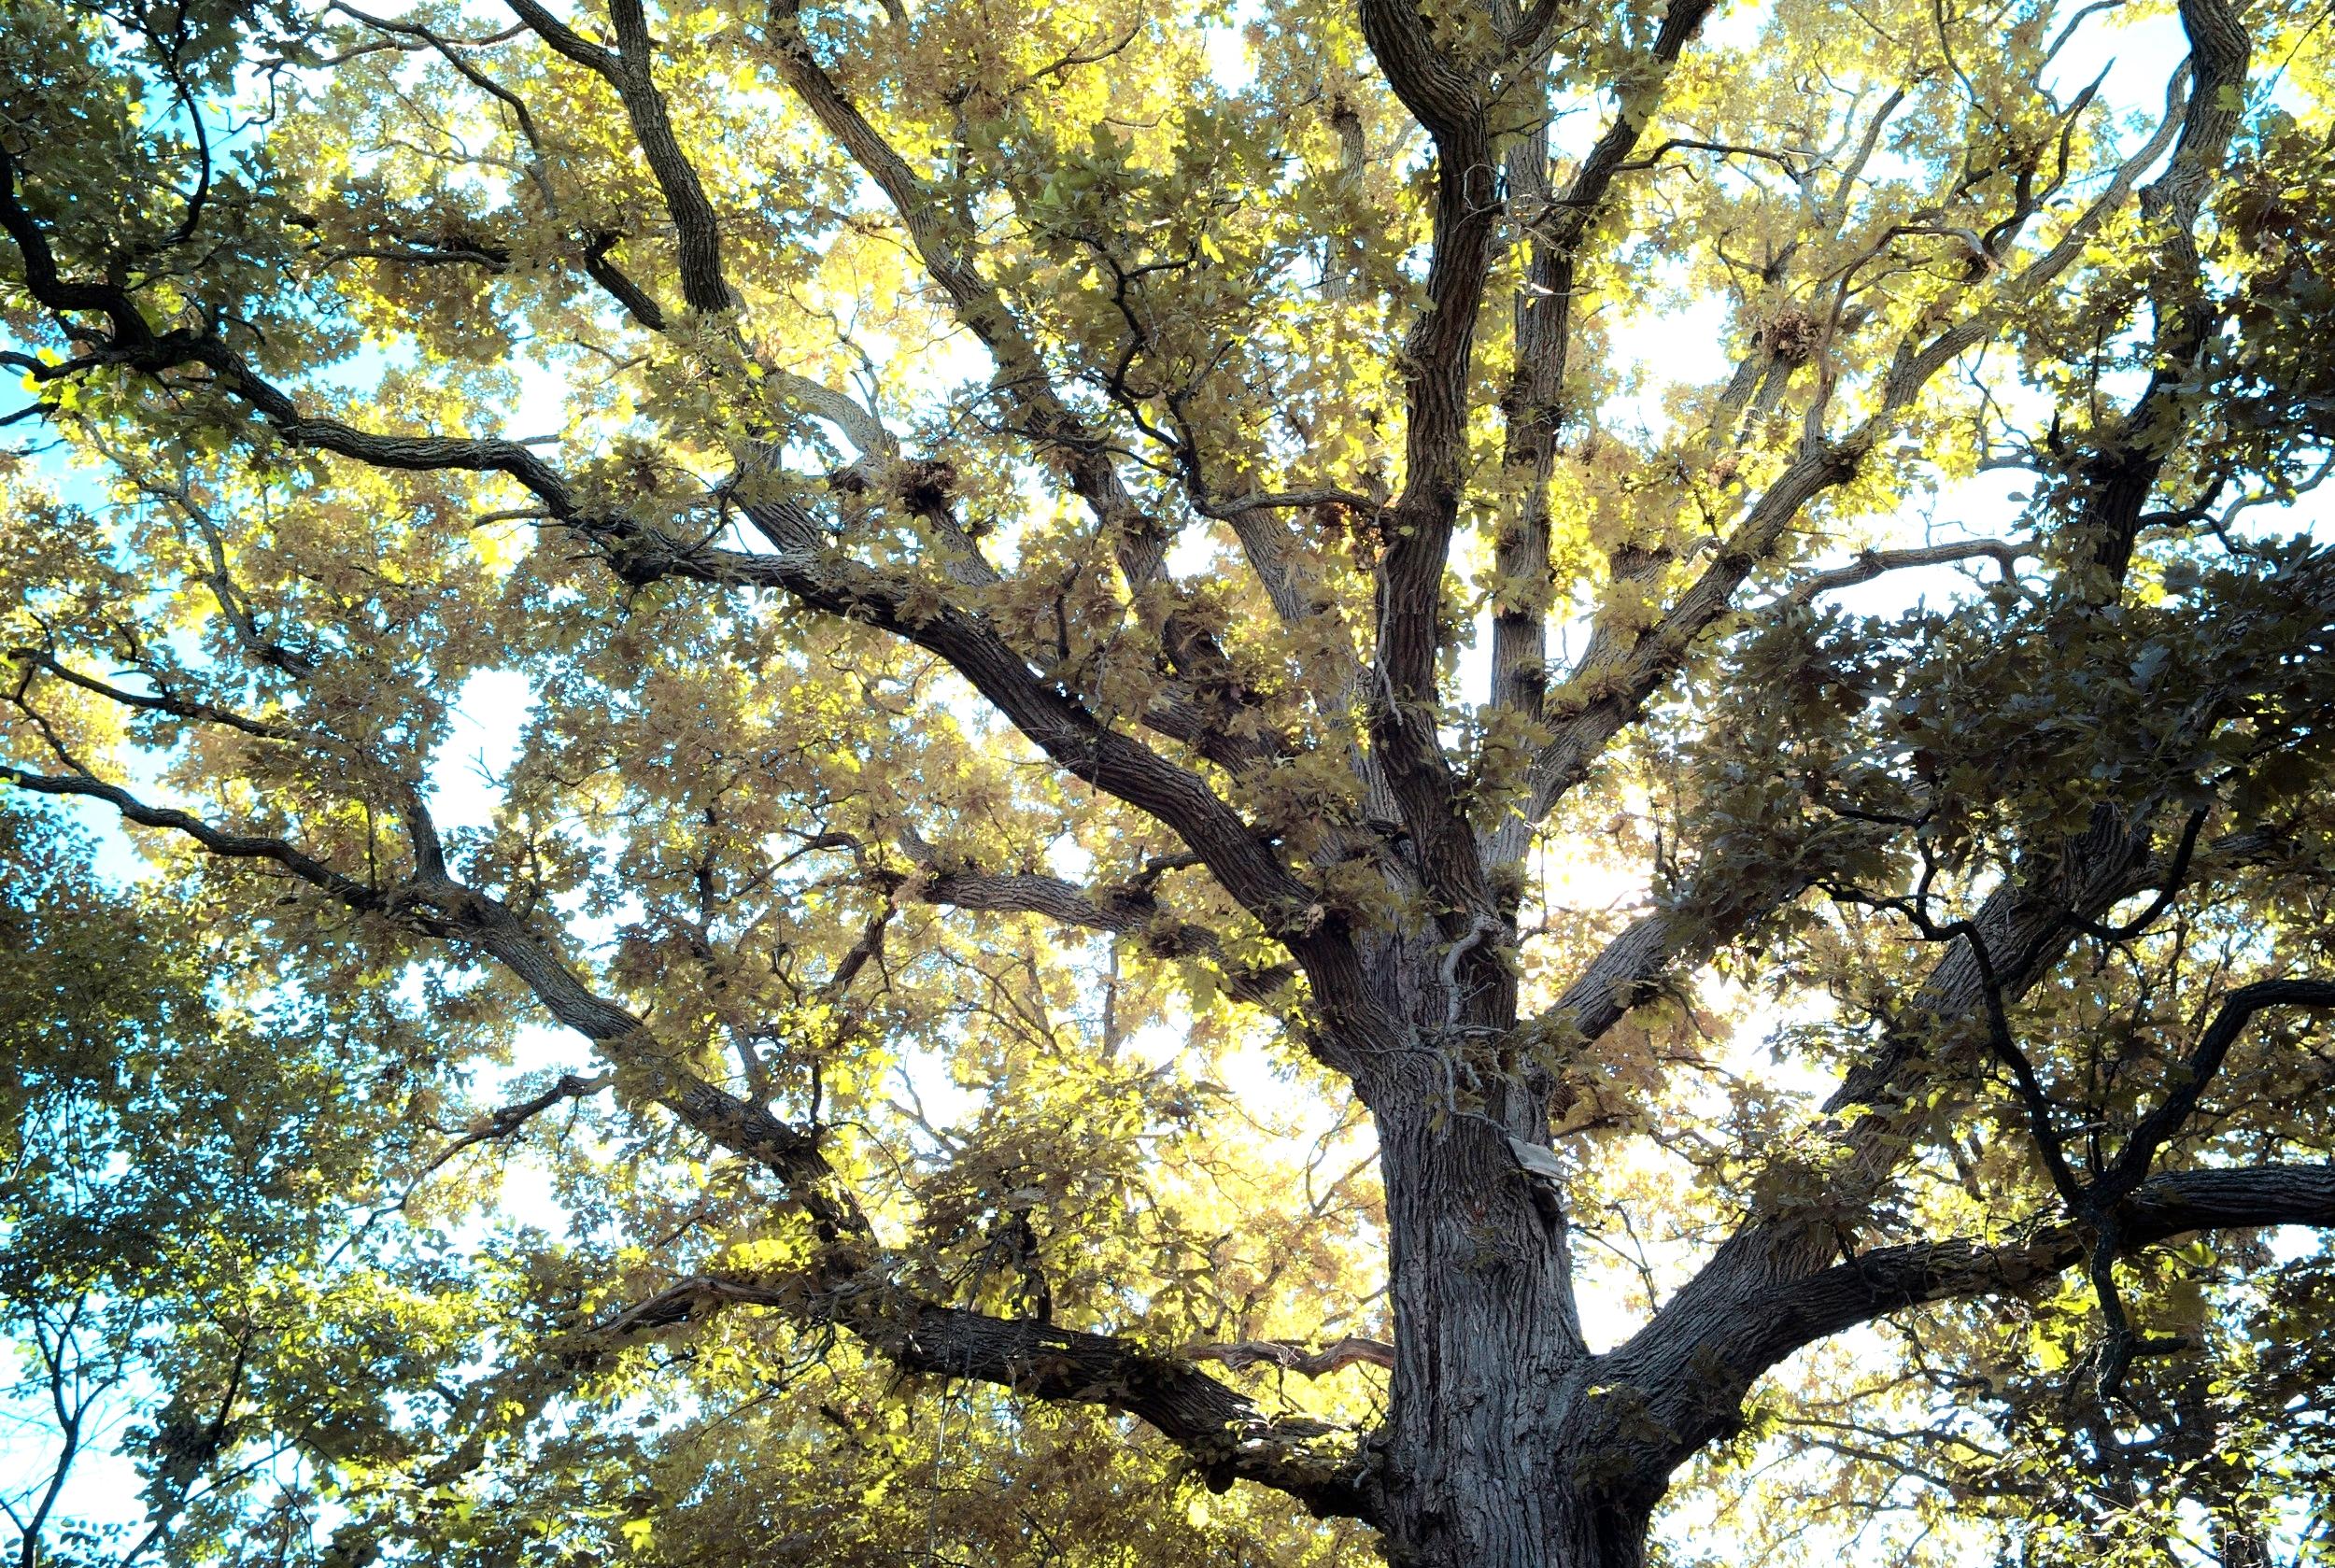 Giant bur oak. Photo: Chris Osler